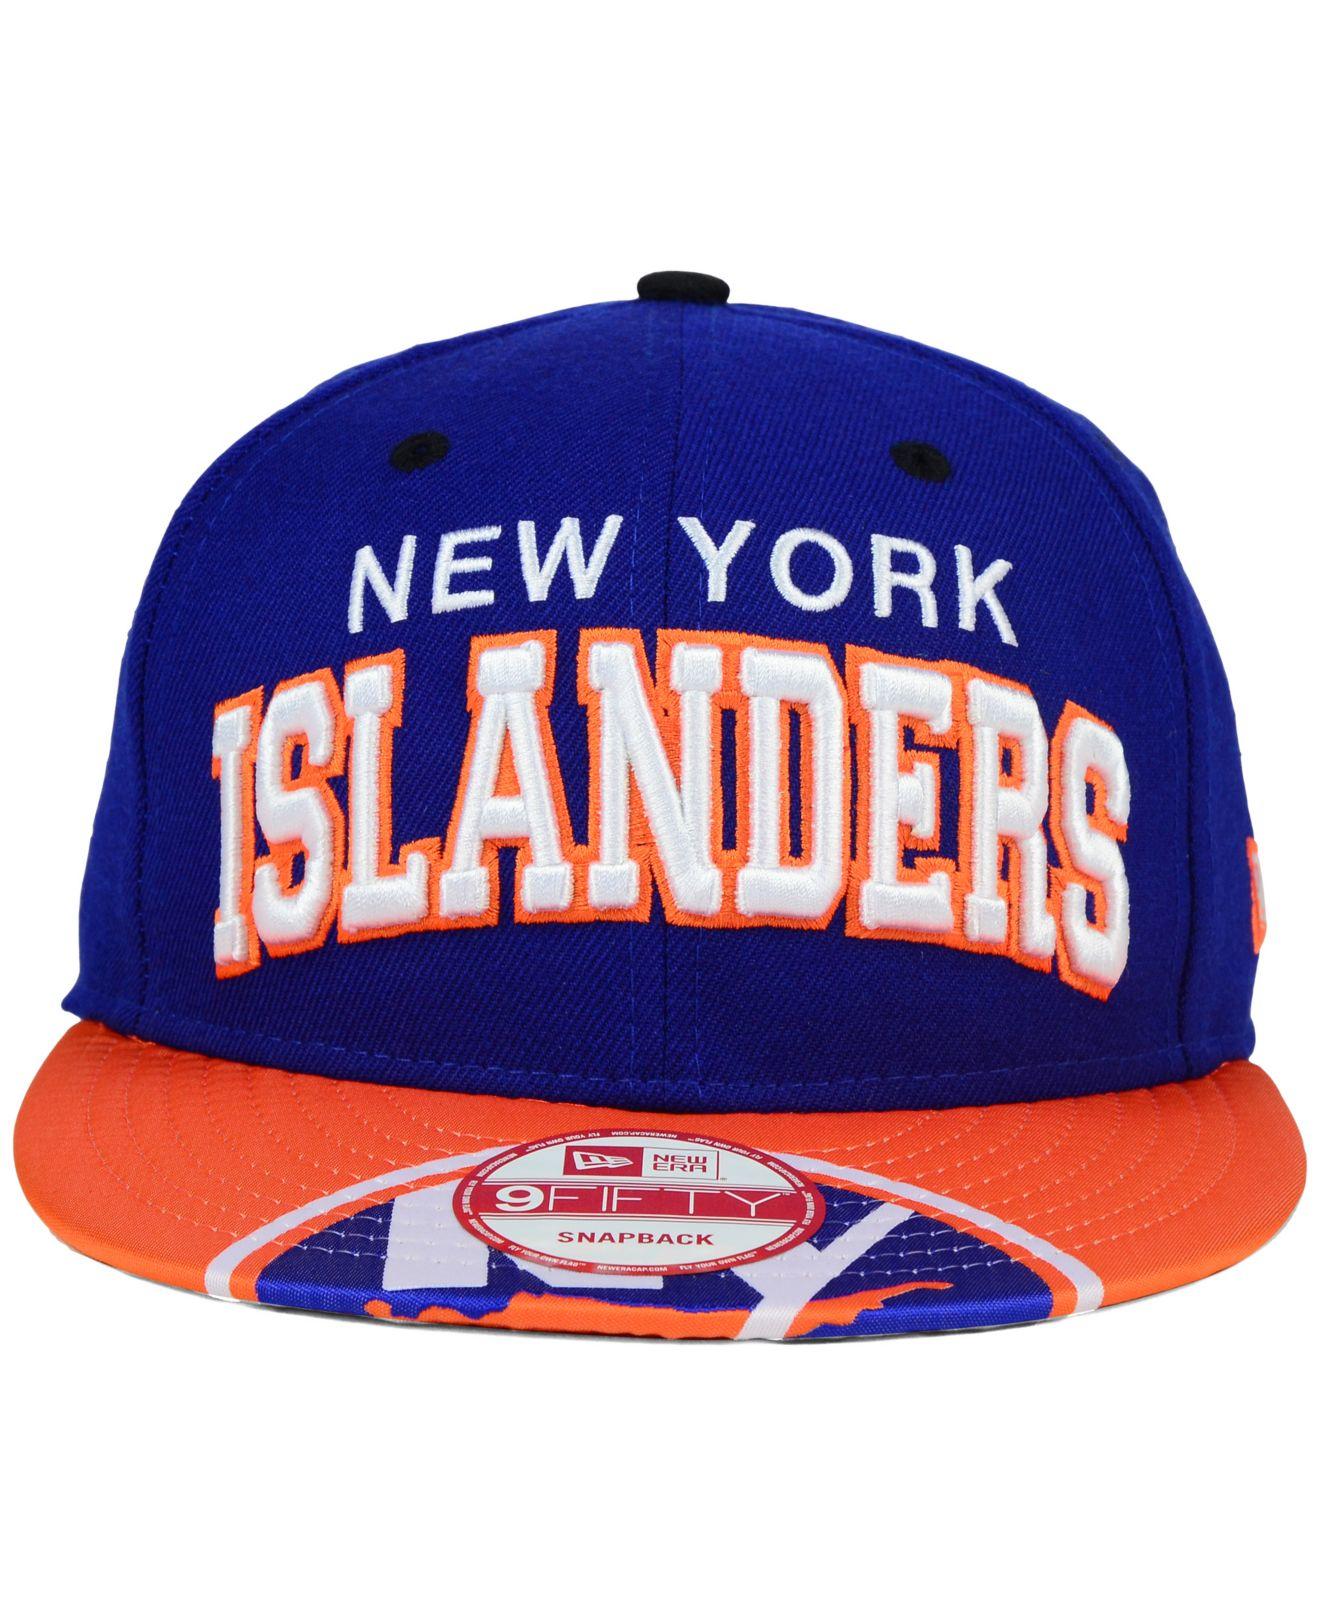 check out 4bf3b 2149b ktz new york islanders flip 9fifty snapback cap in